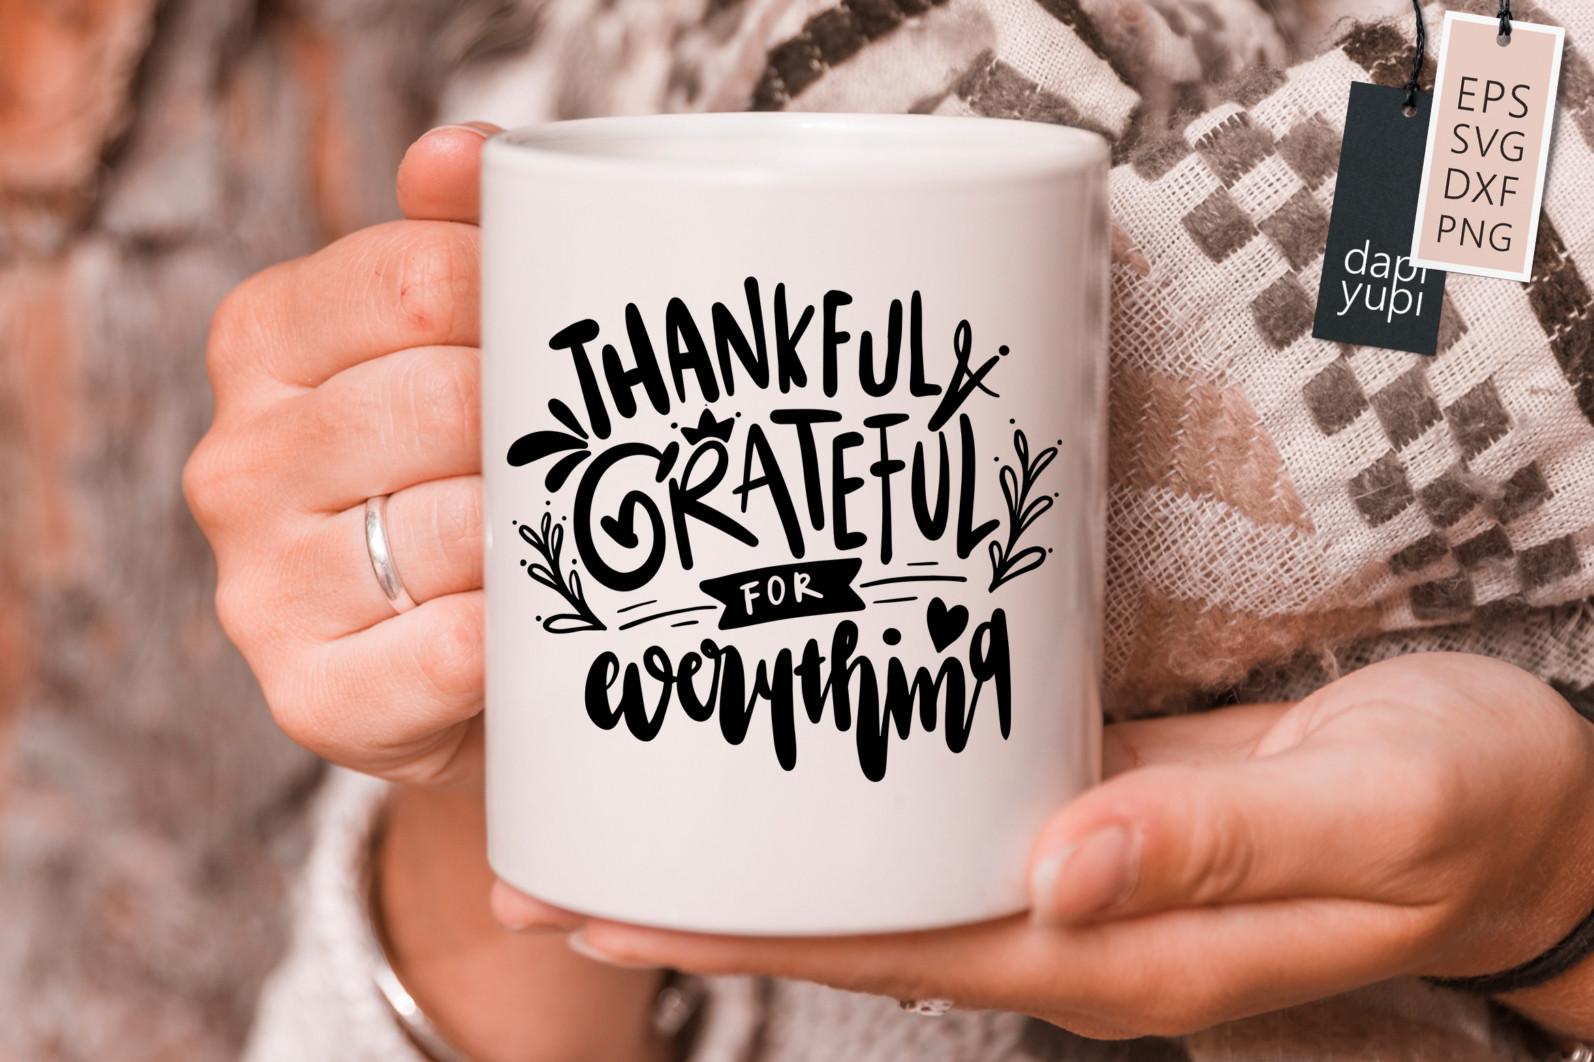 Gratitude Lettering Quotes Bundle Grateful SVG - grateful8s -